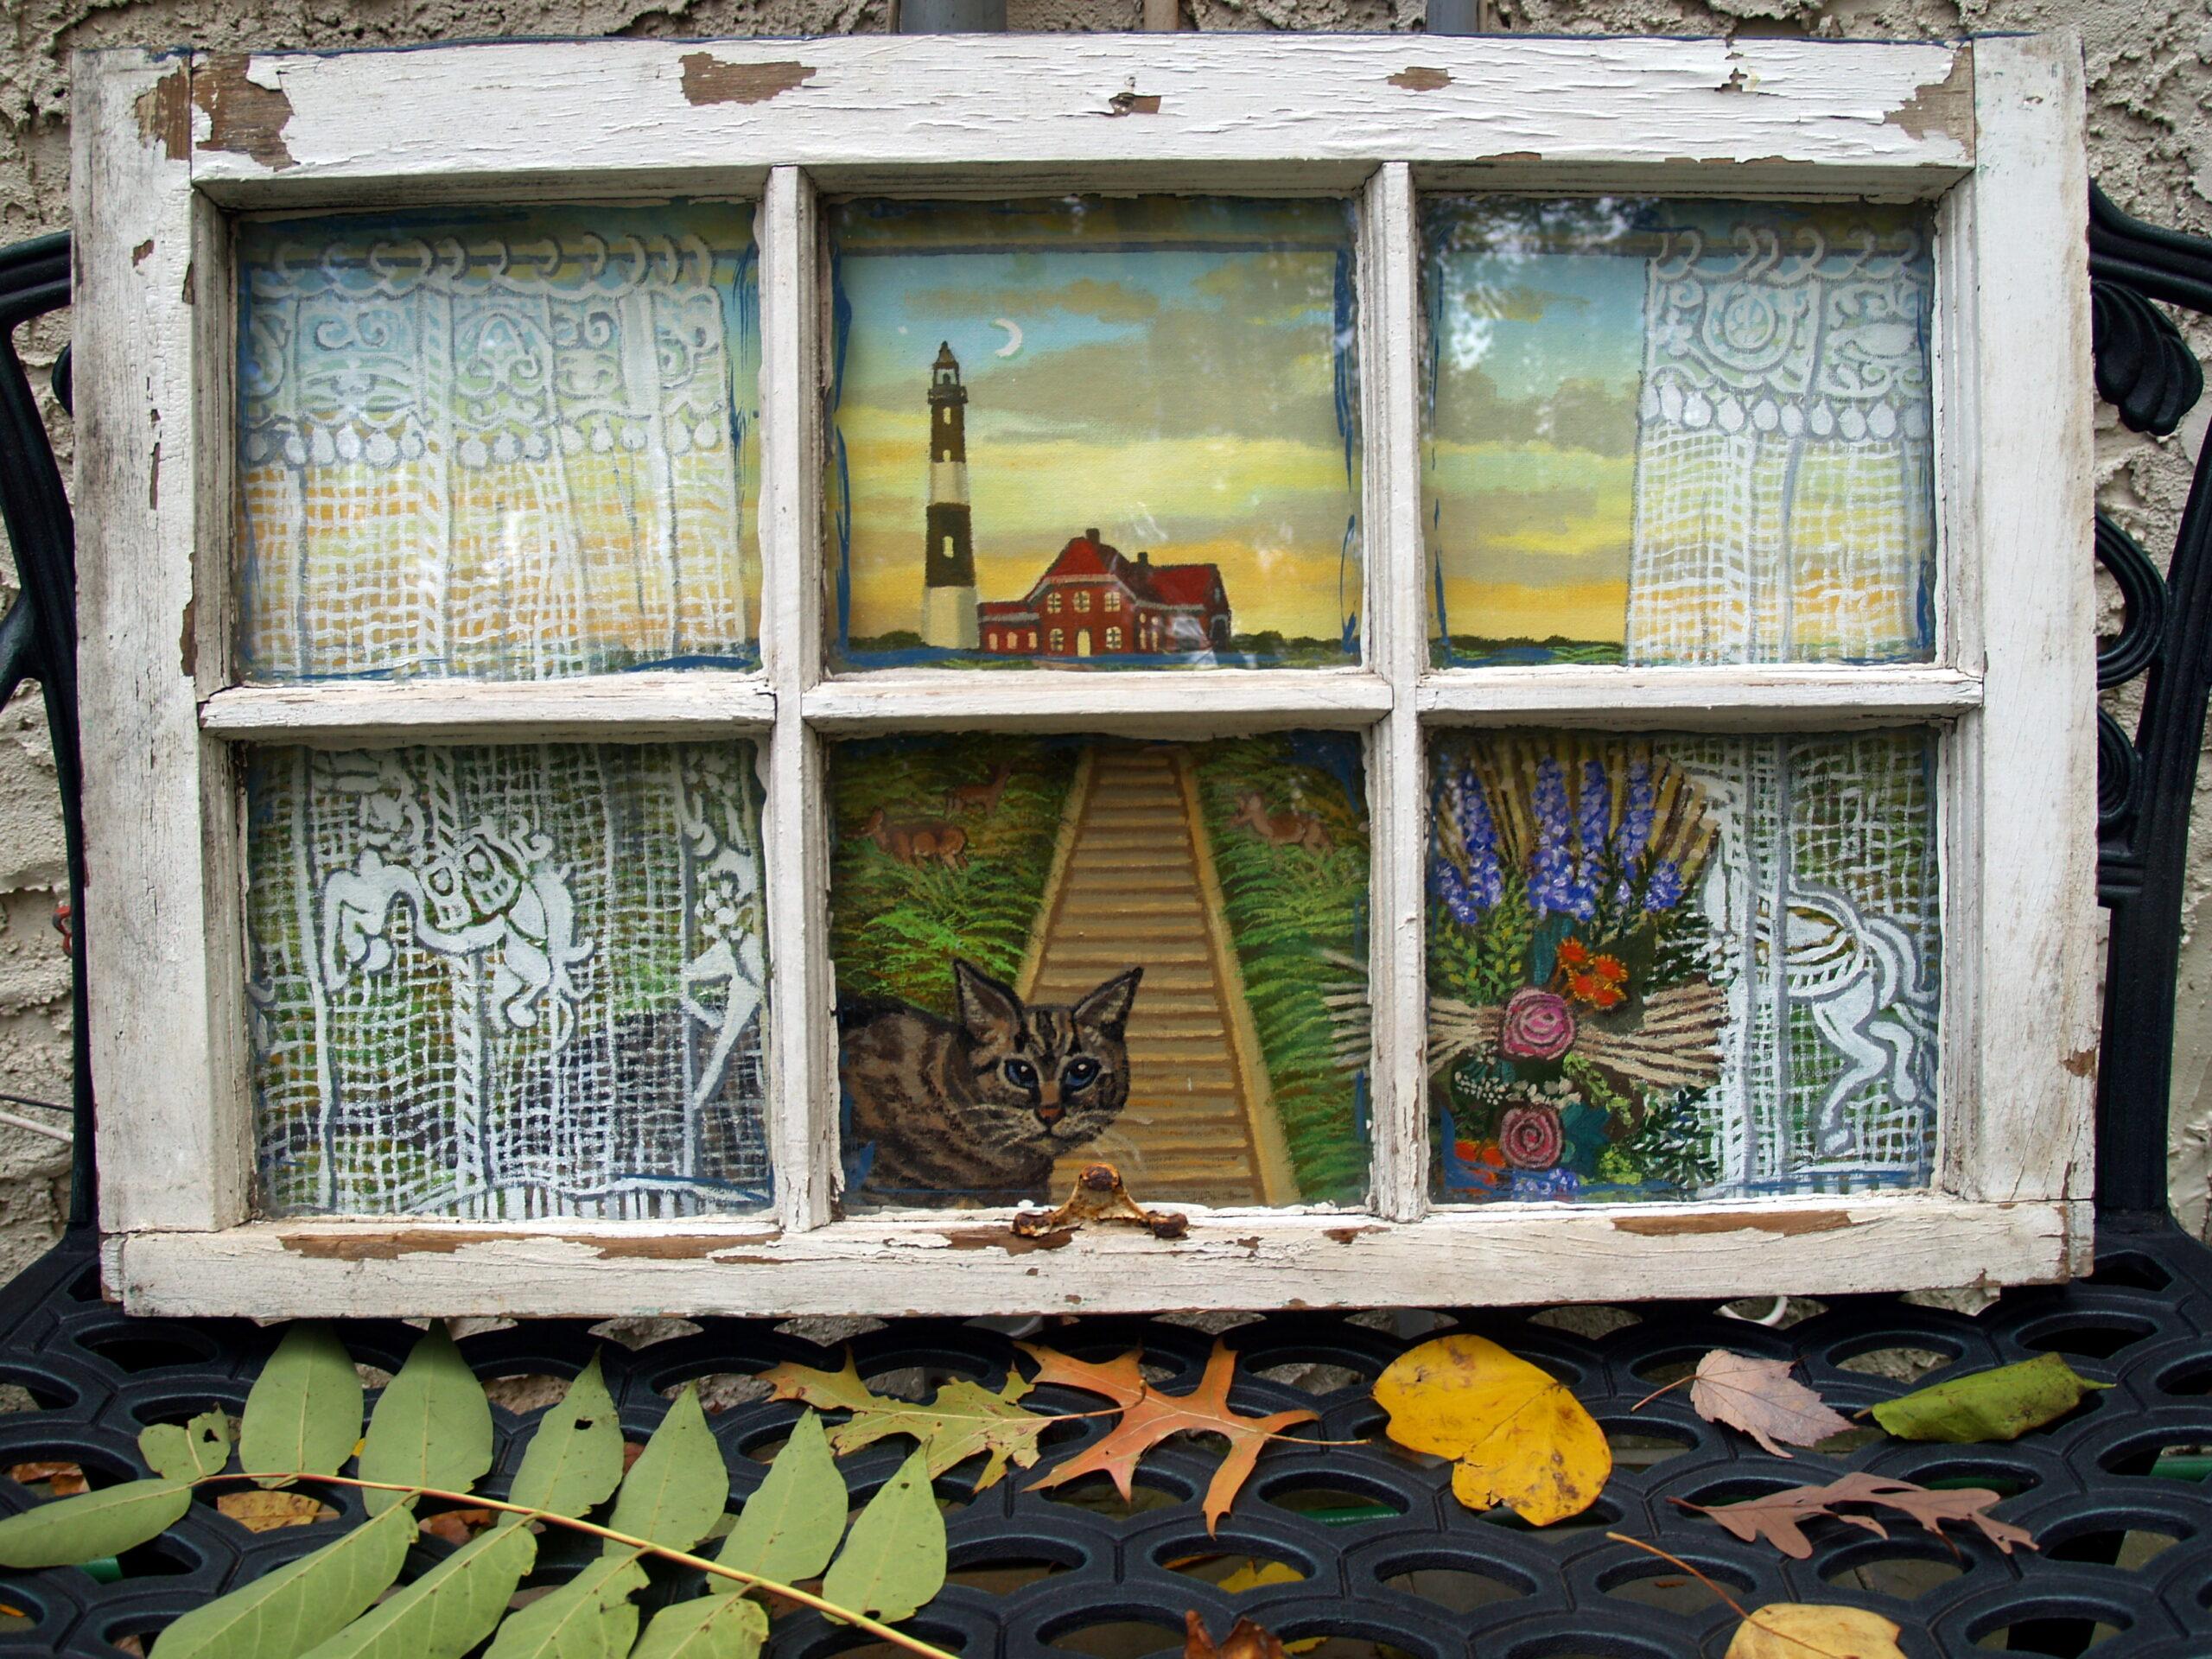 Fire Island Light House Acrylics On Canvas In An Old